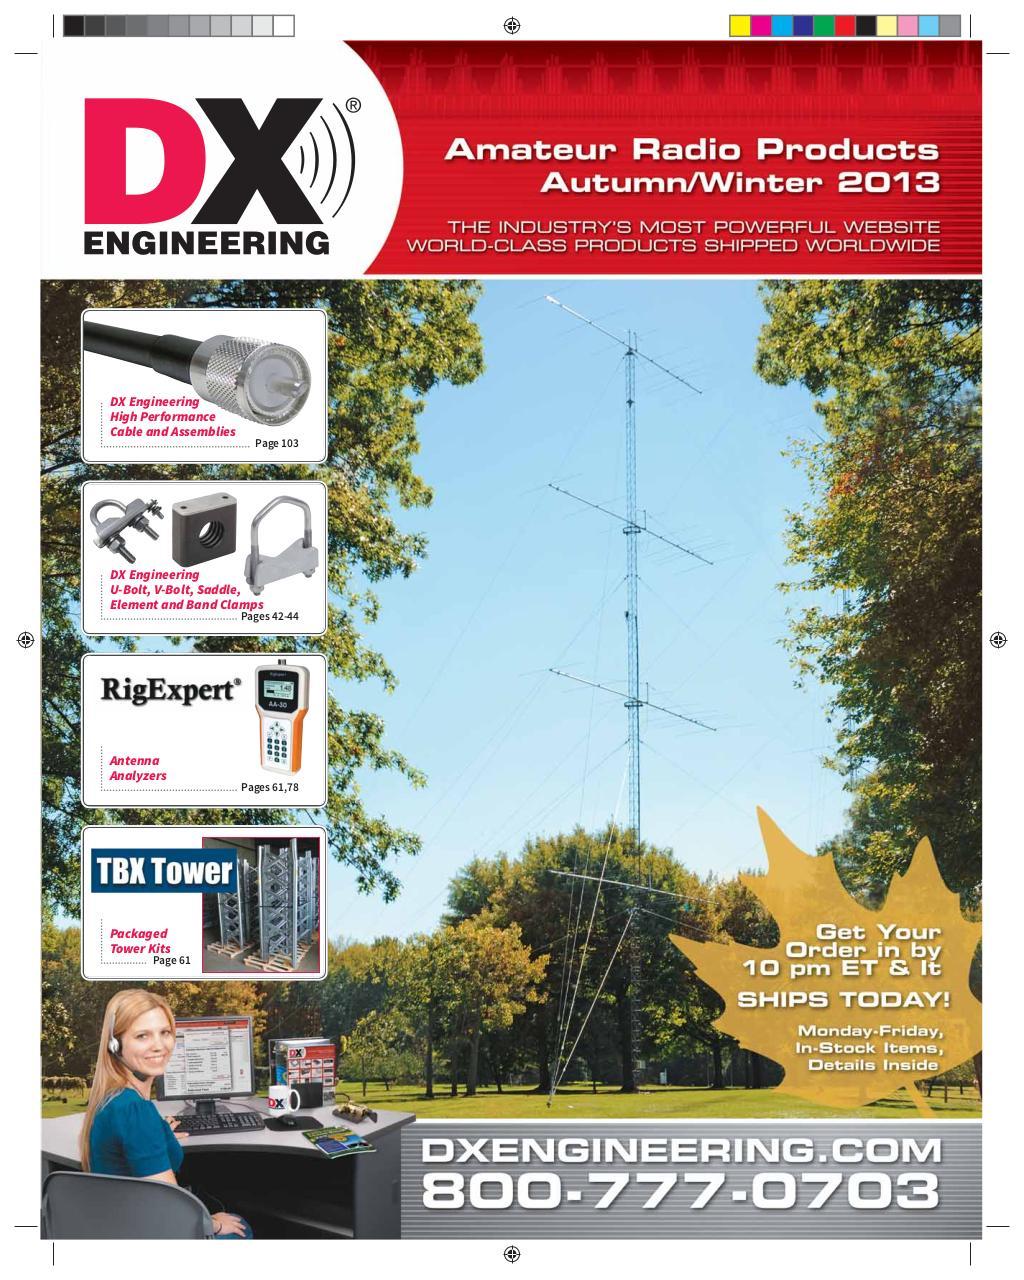 Ham Amateur Radio Antennas Dx Engineering Ground Plate And Tilt